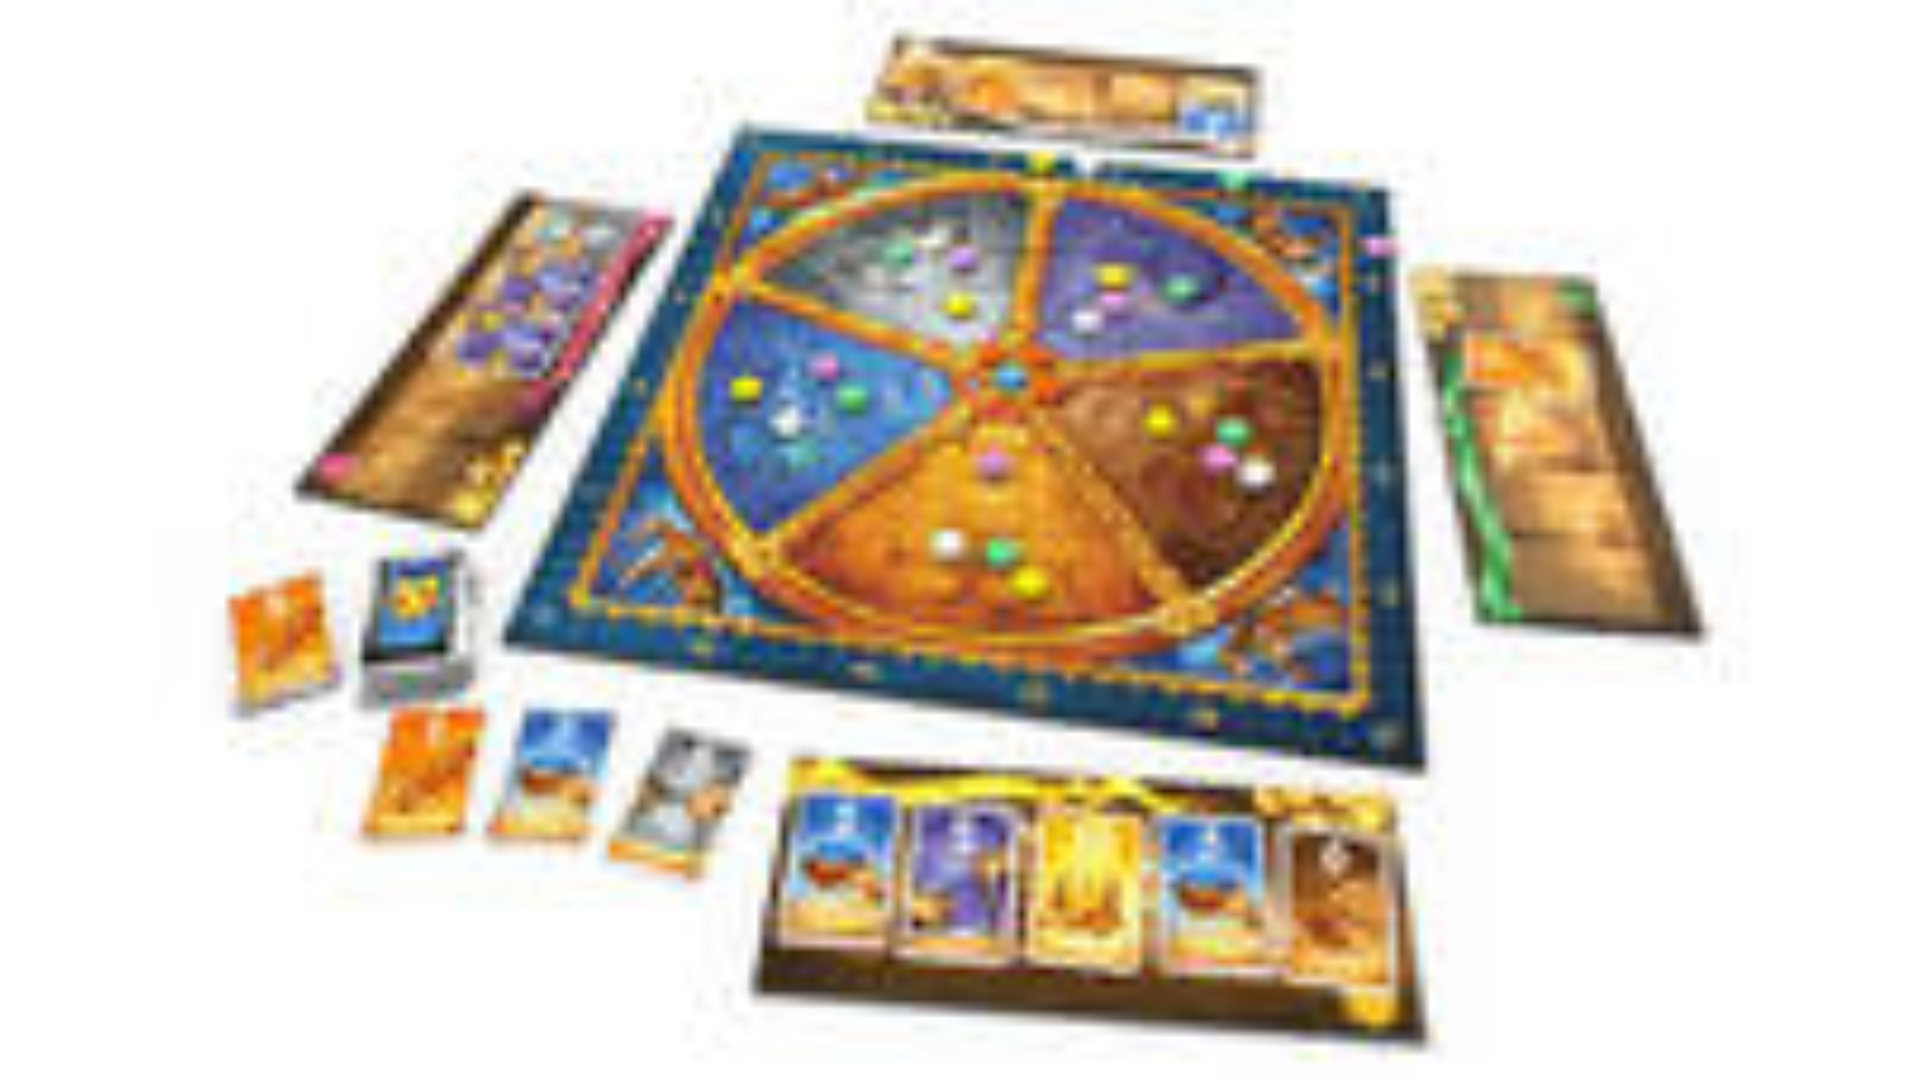 Medici board game layout